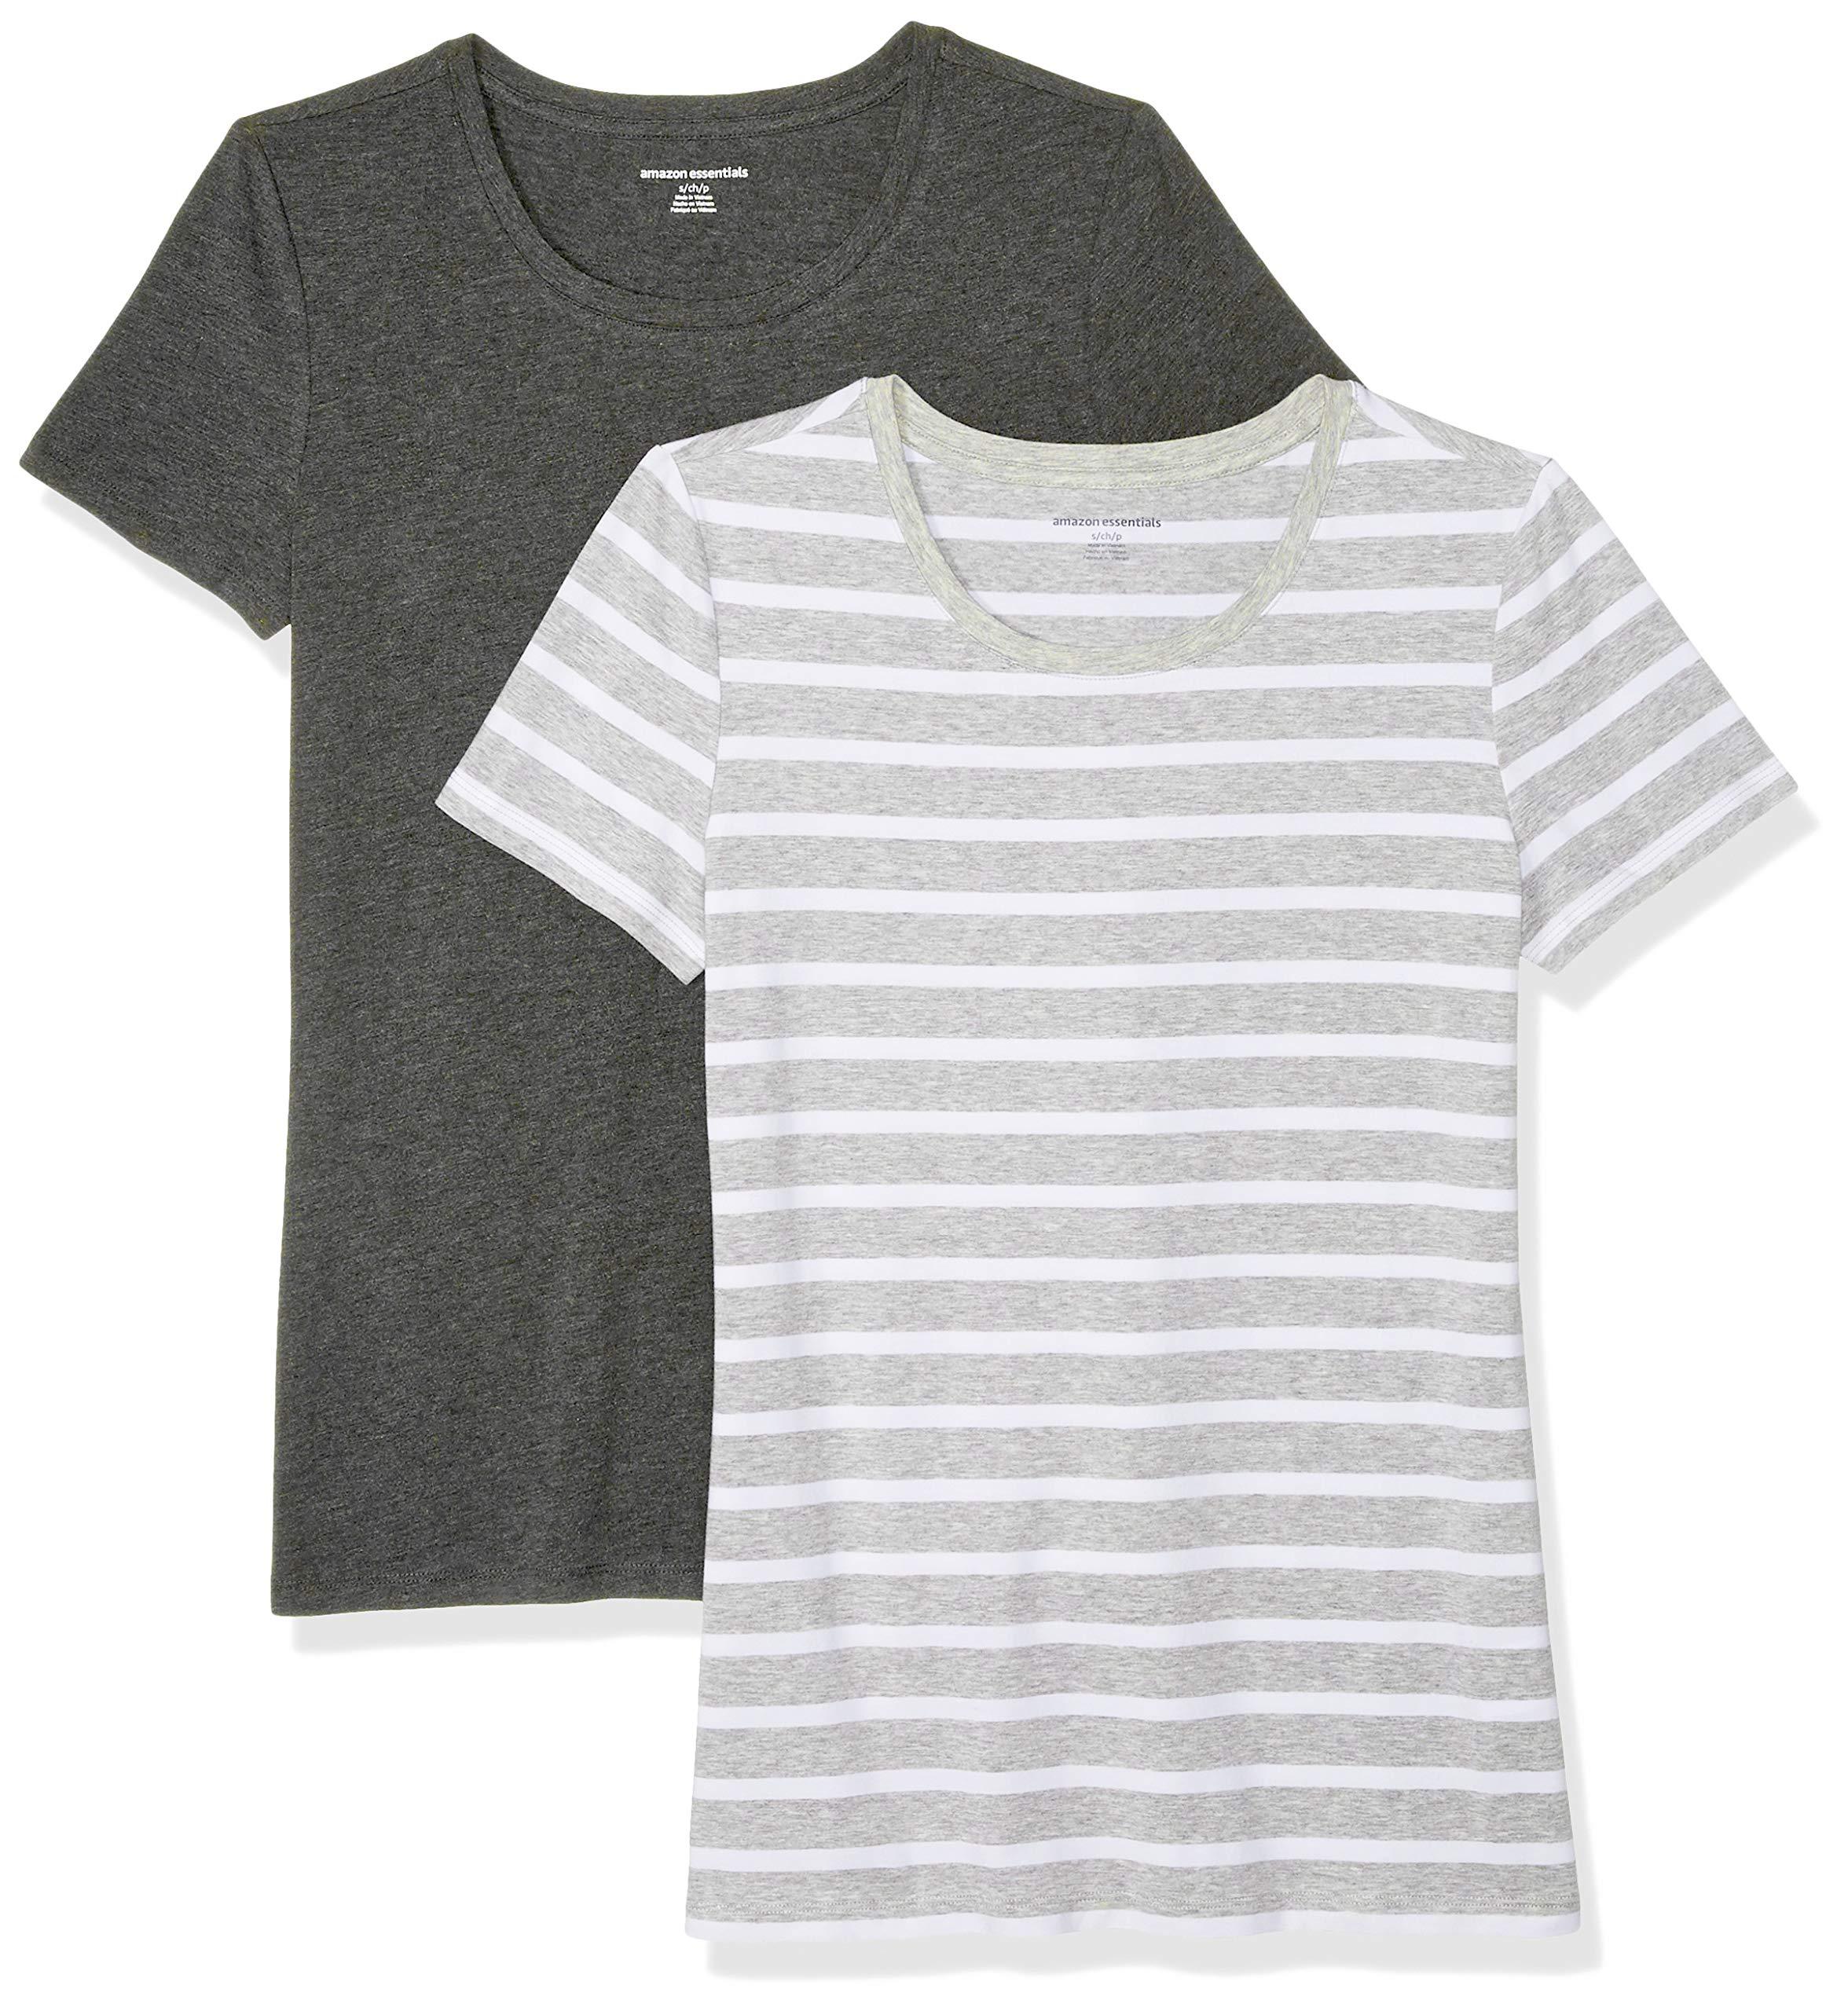 Amazon Essentials Women's 2-Pack Short-Sleeve Crewneck T-Shirt, Light Grey Mariner Stripe/Charcoal Heather, Large